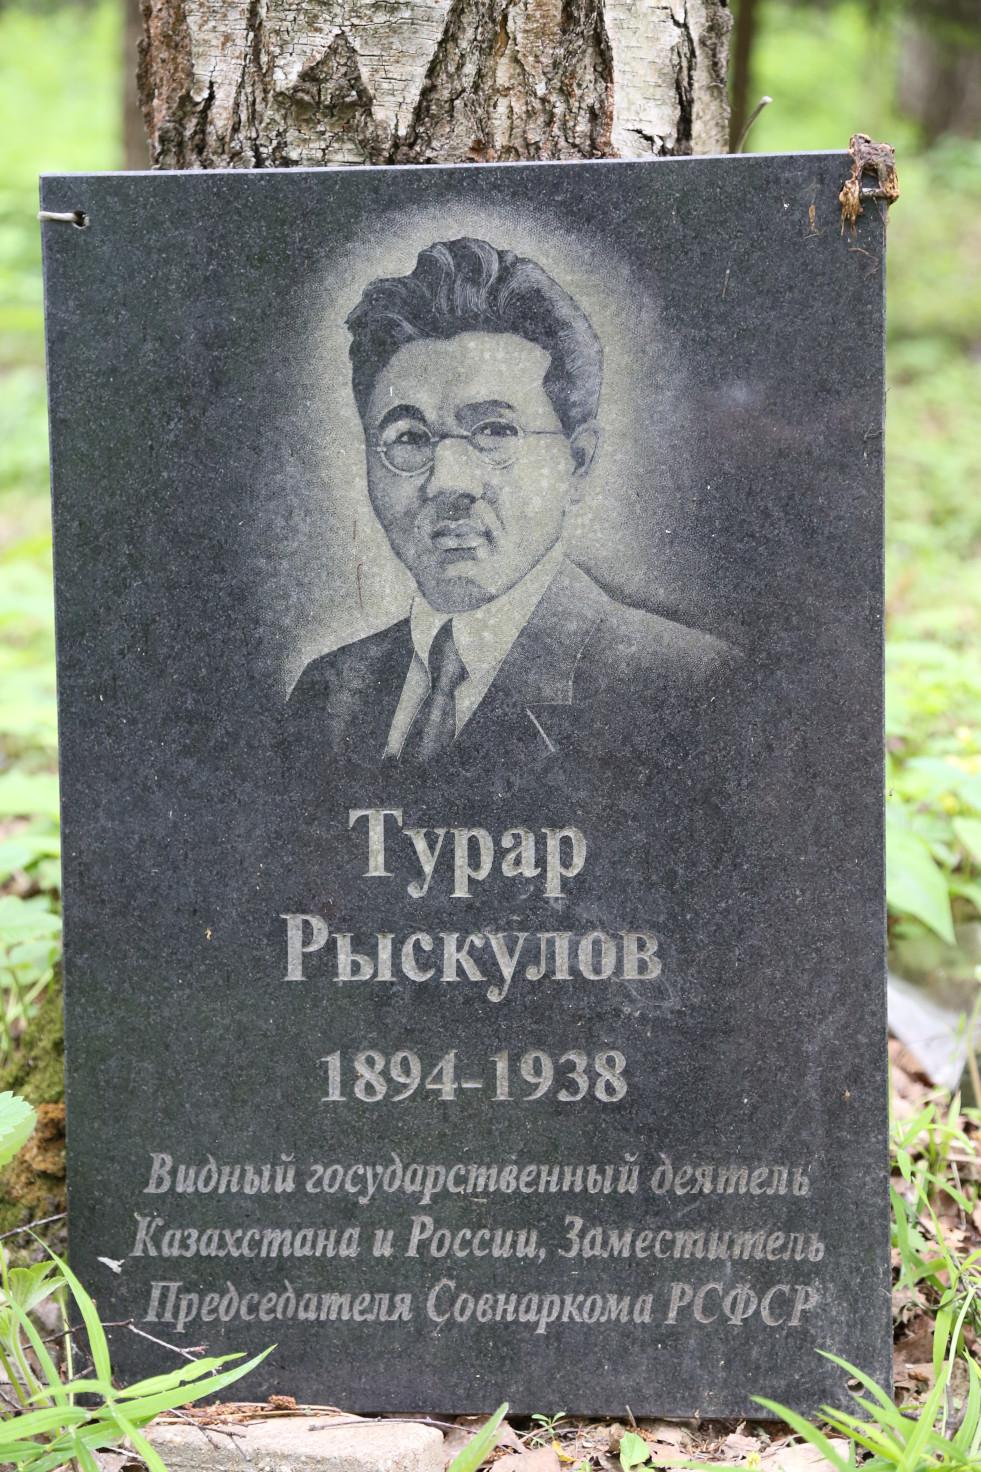 Символическое надгробие Т.Р. Рыскулова. Фото 07.06.2018